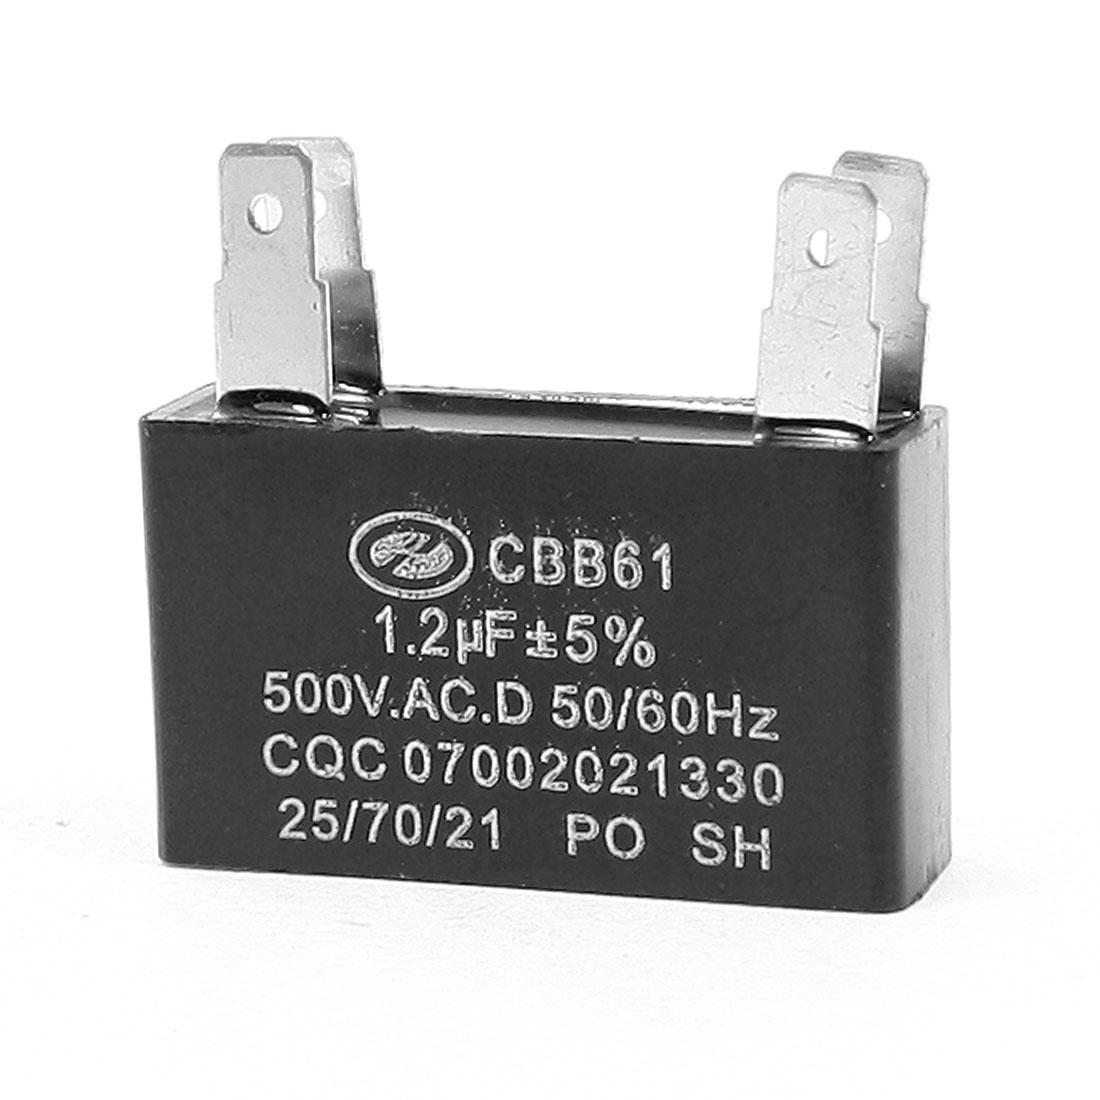 1.2uF MFD 500VACD 50/60Hz 4 Terminals Fan Capacitor CBB61